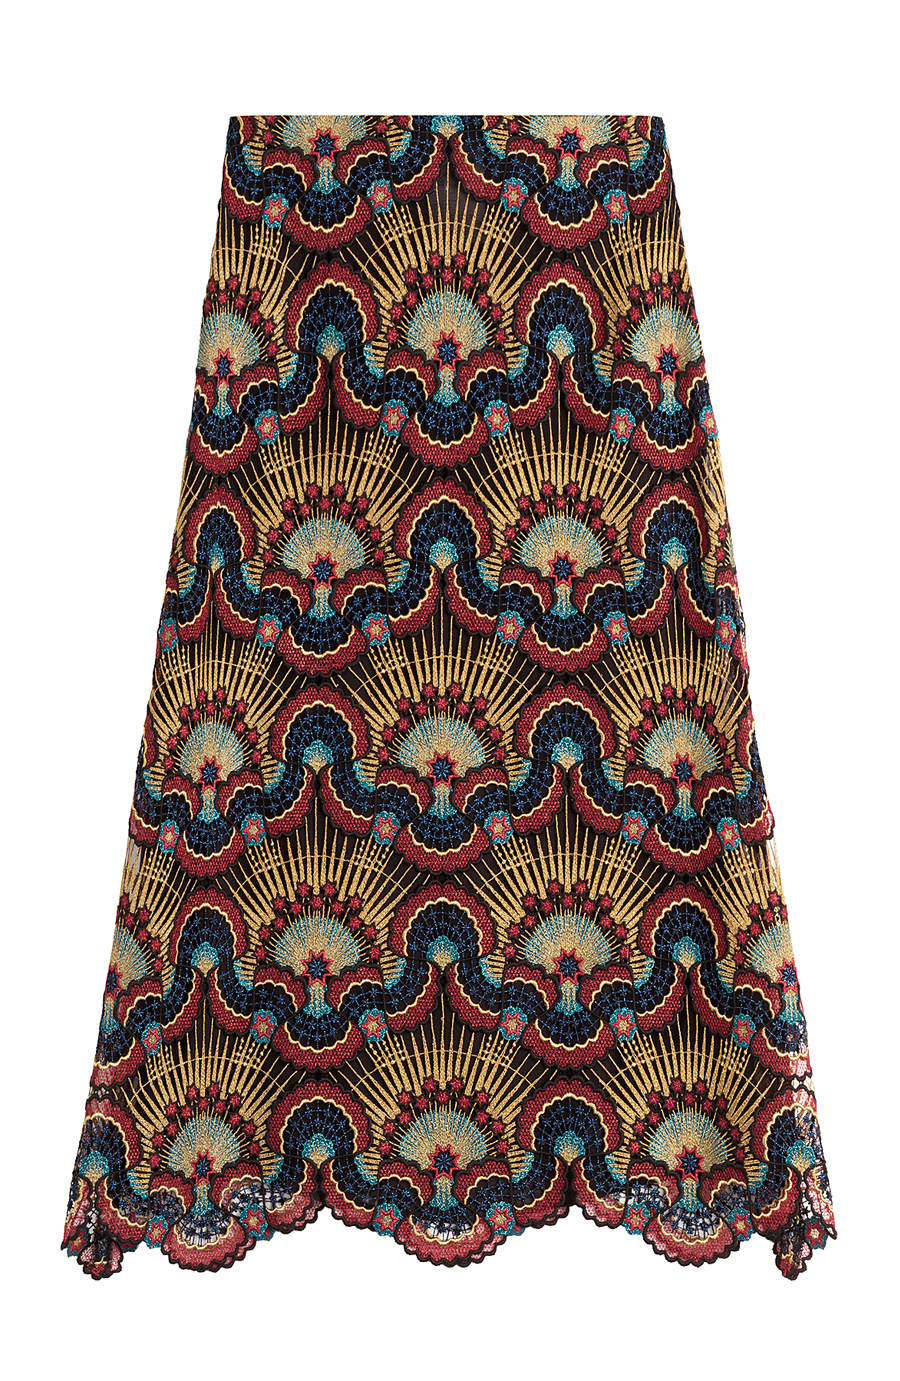 Valentino Enchanted Wonderland MacramÉ-lace Midi Skirt In Multicolored